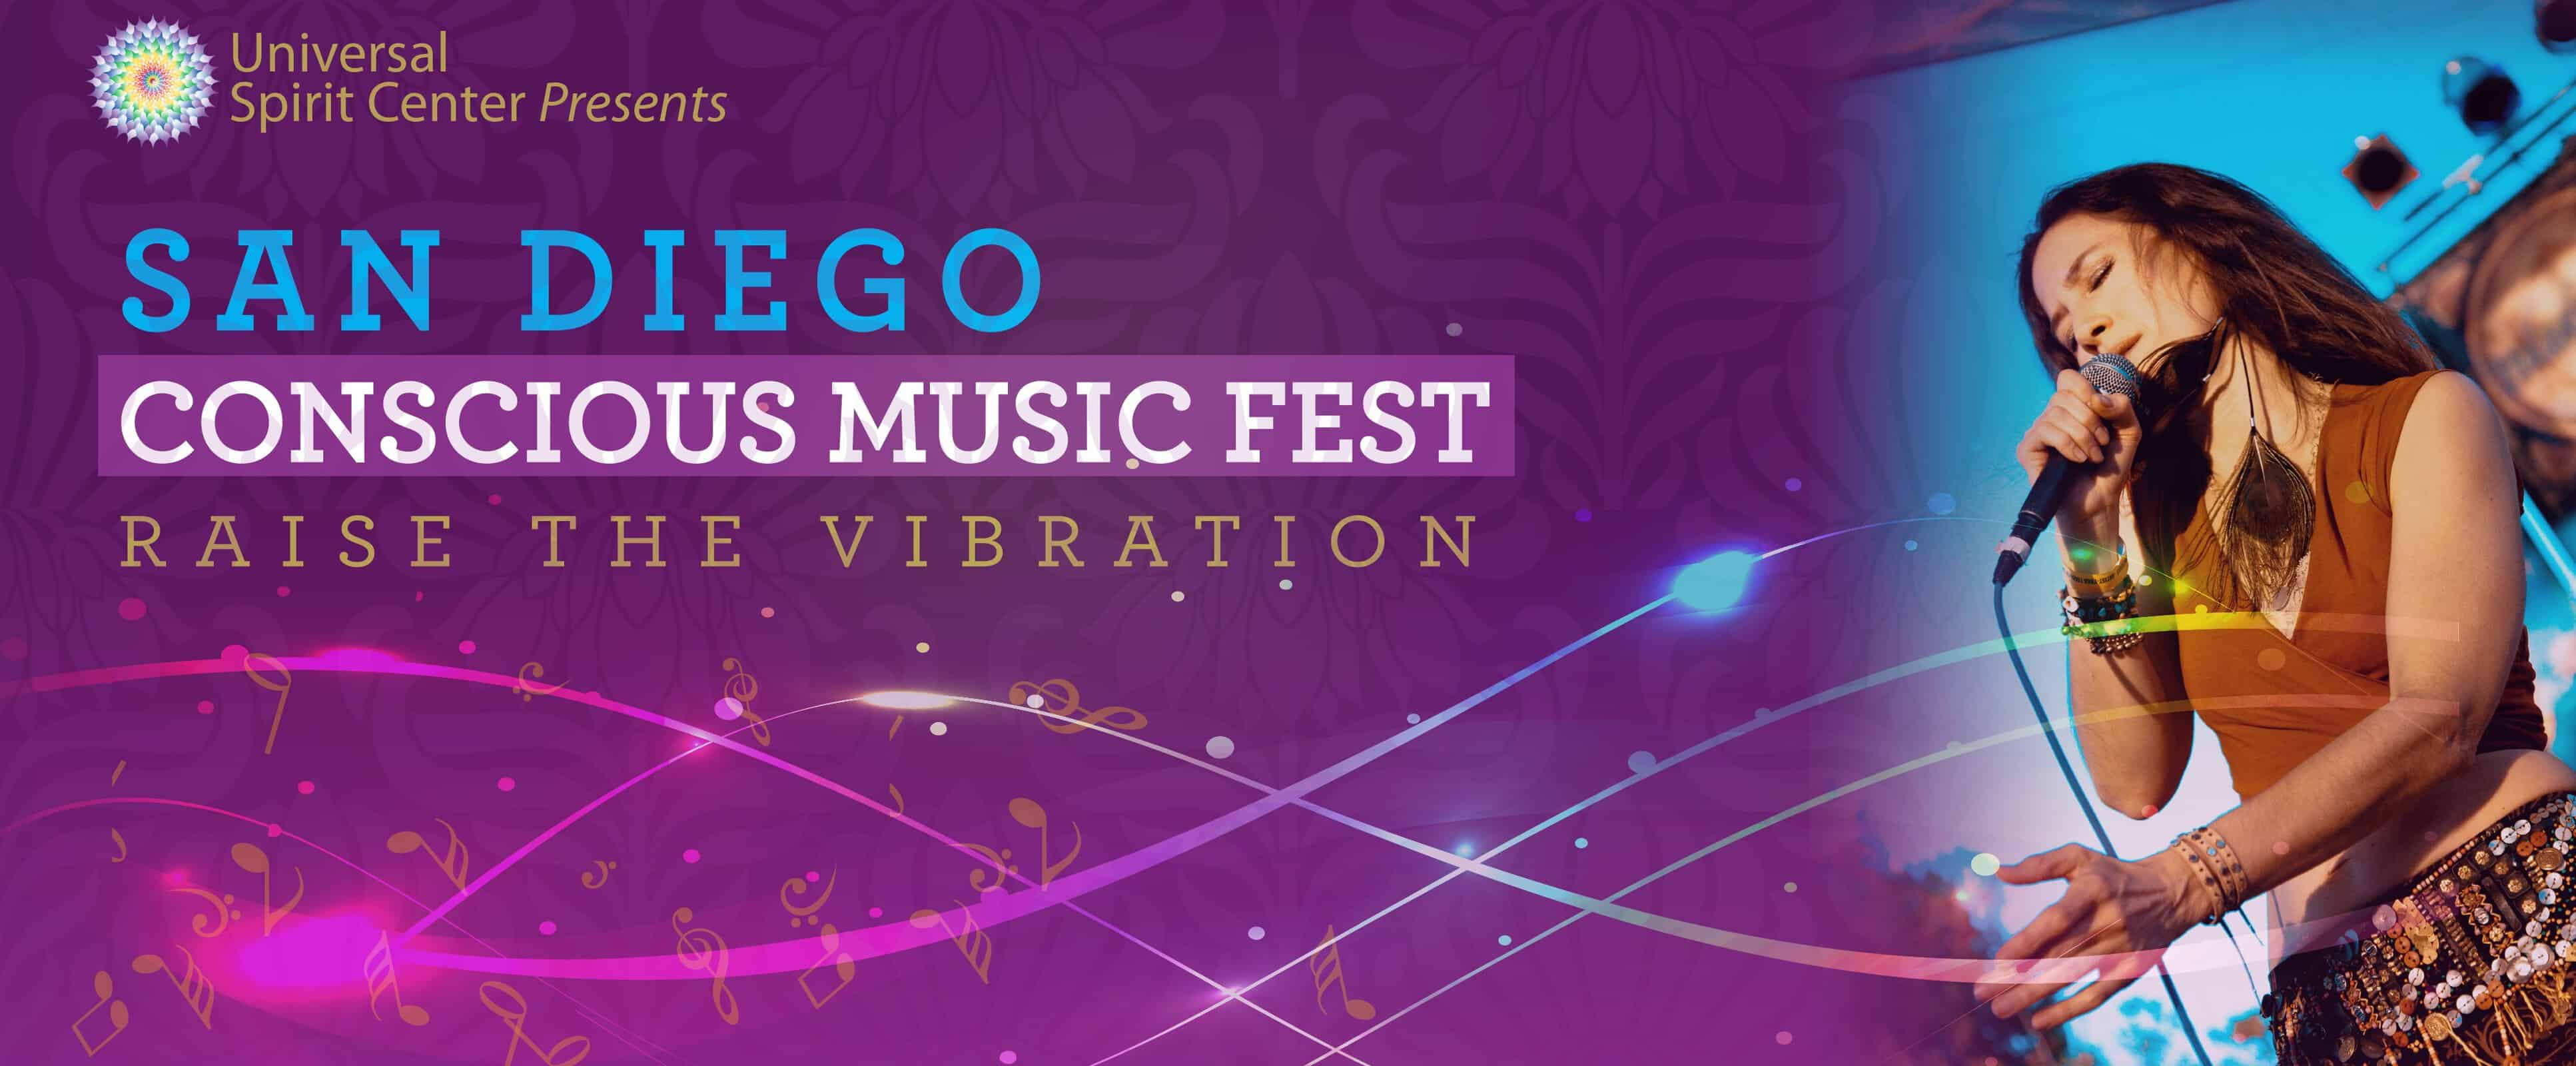 San Diego Conscious Music Fest